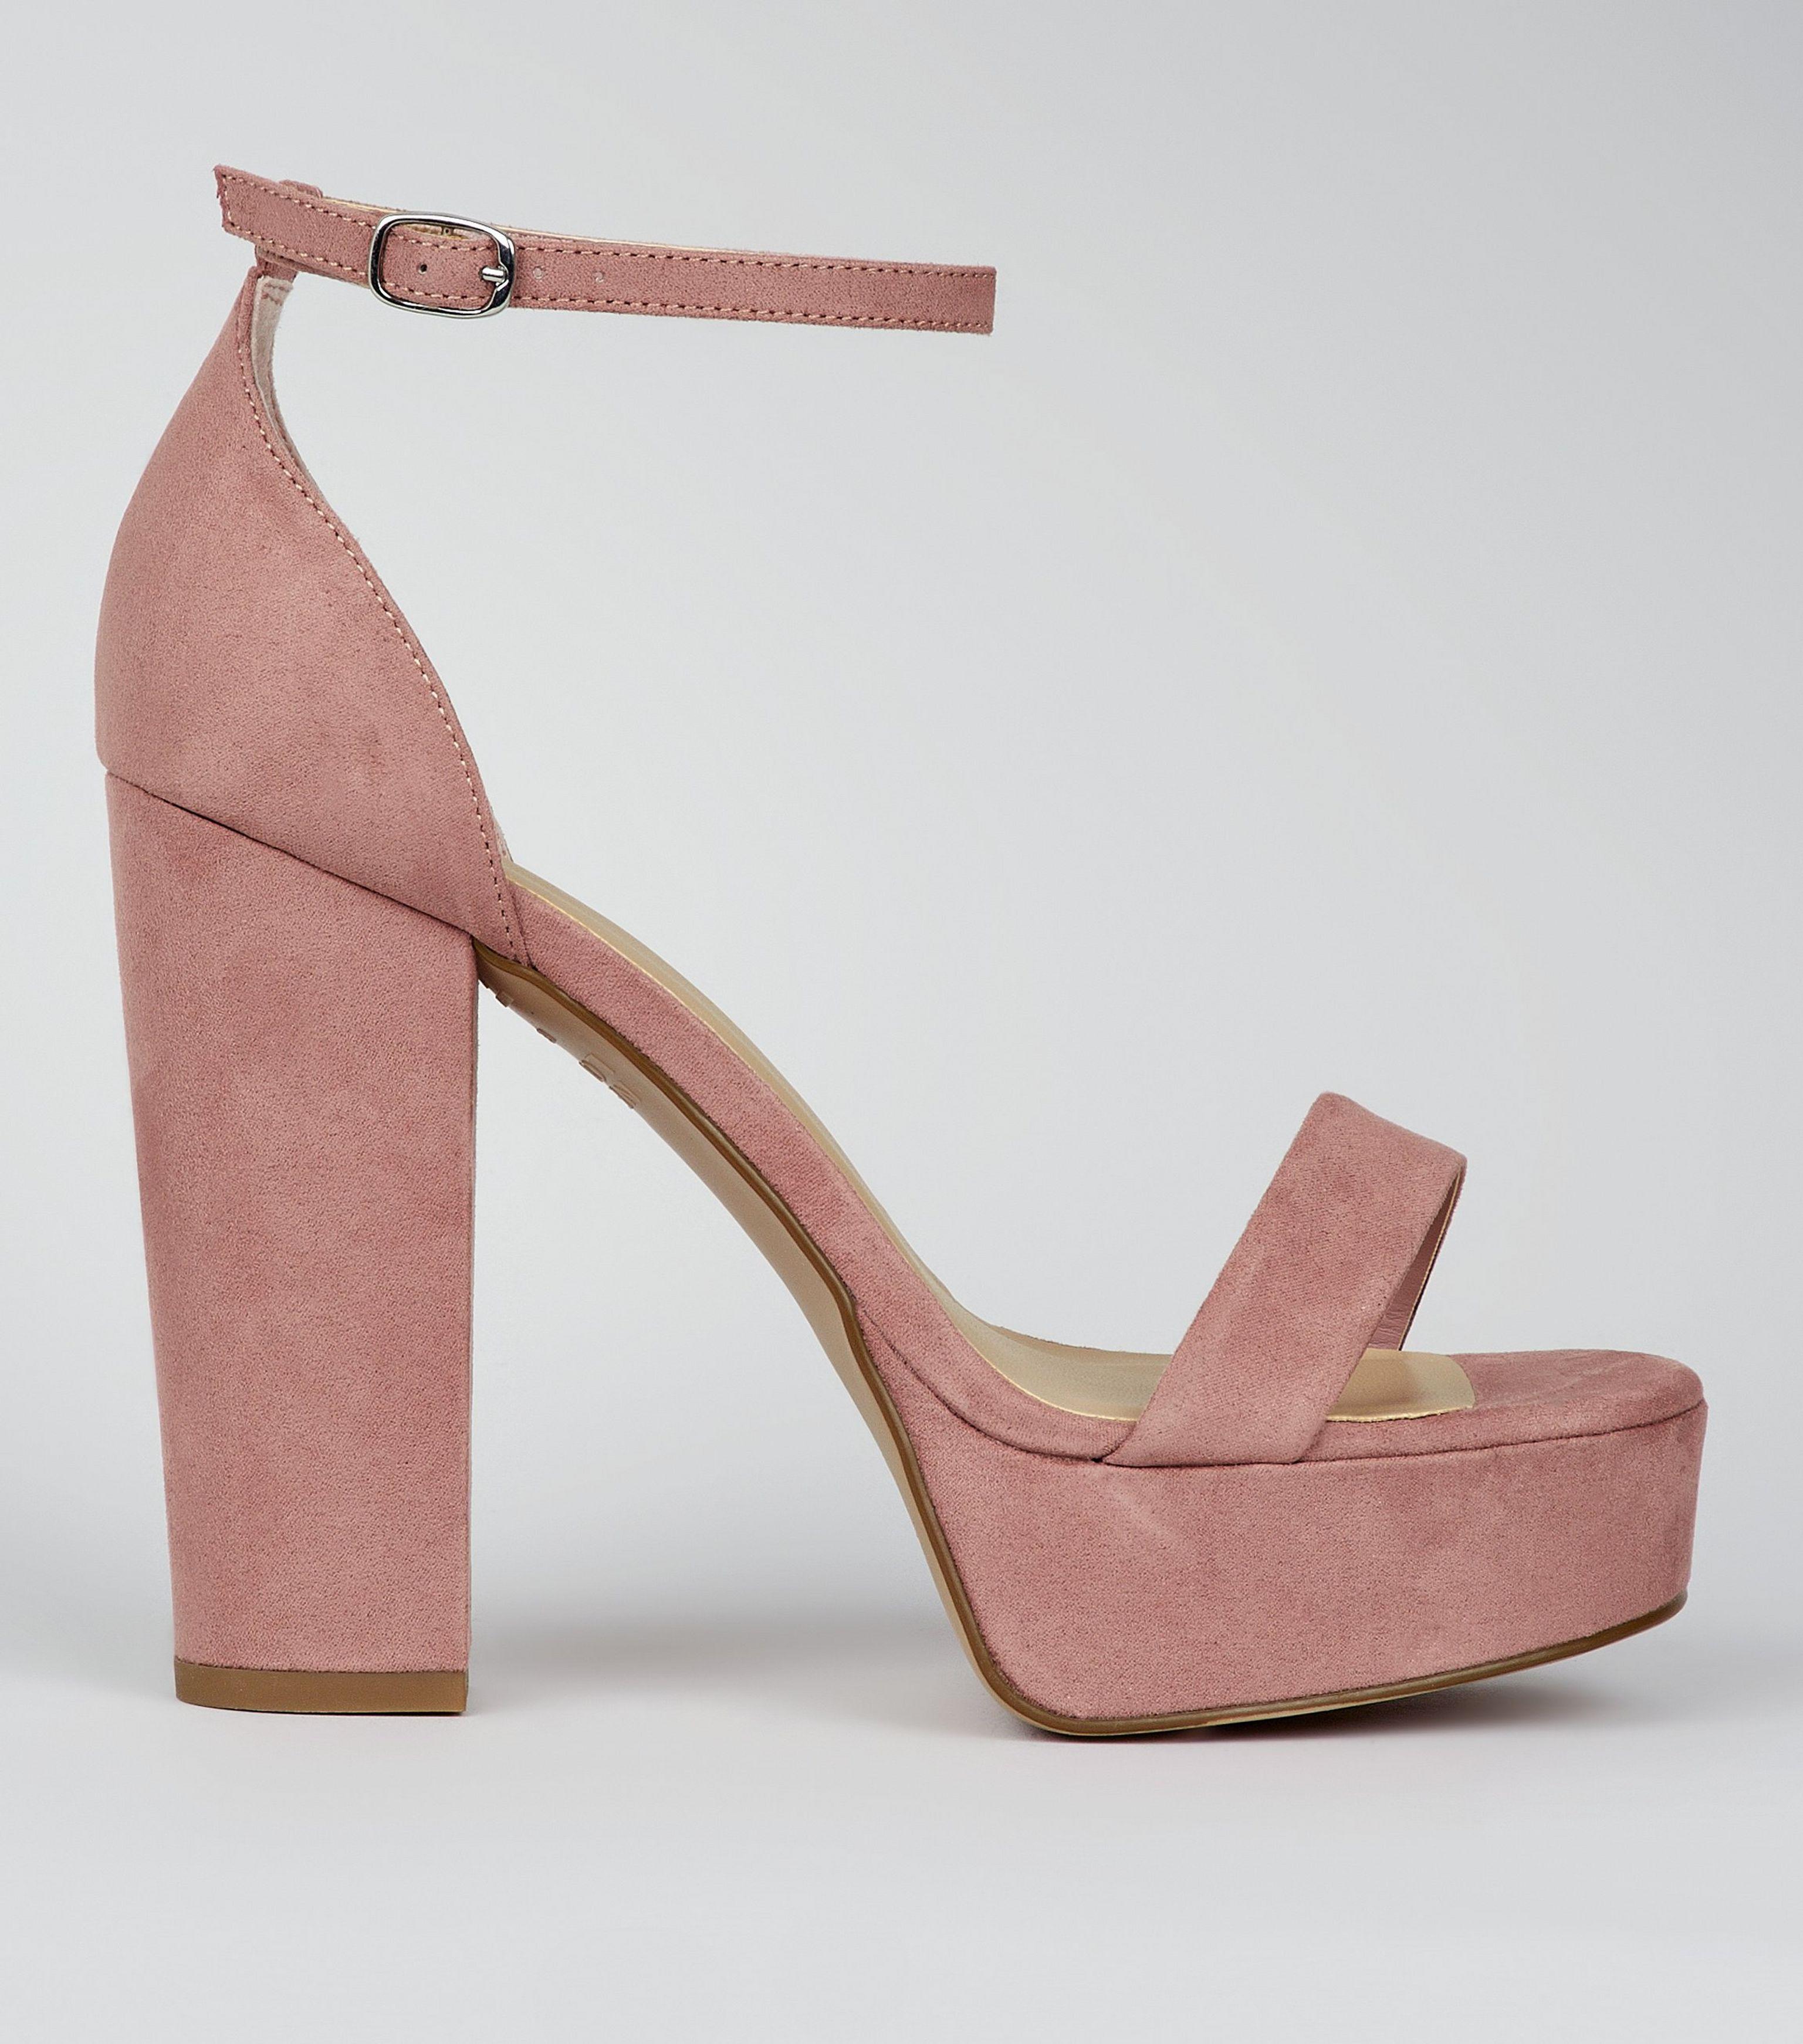 23dcad1c103 New Look Wide Fit Pink Suedette Platform Heels in Pink - Lyst